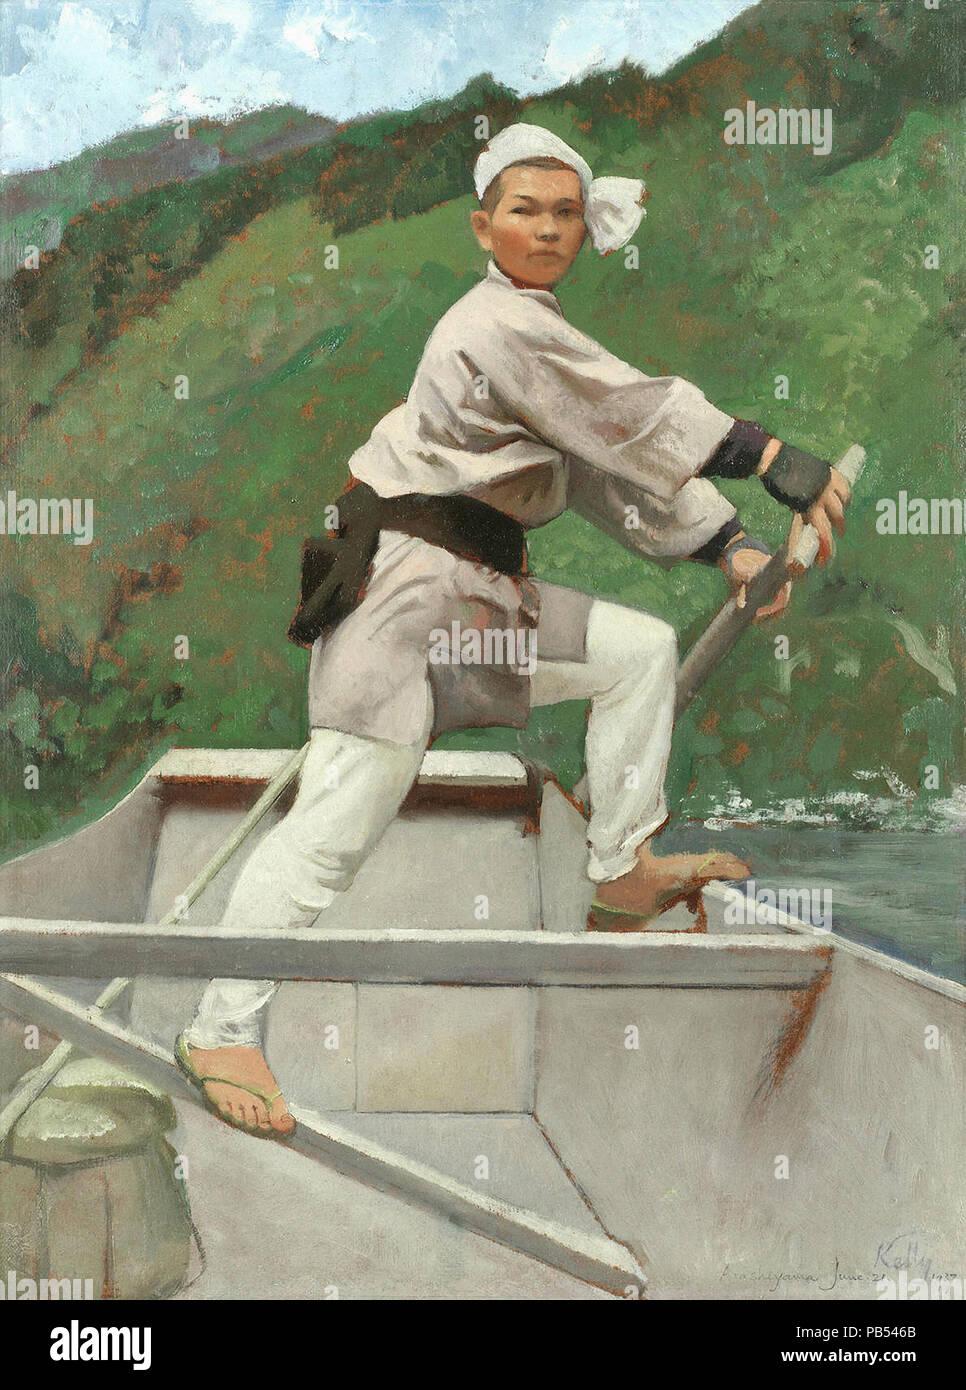 Kelly  Gerald Festus - Steersman on the Hozu Rapids  Japan - Stock Image